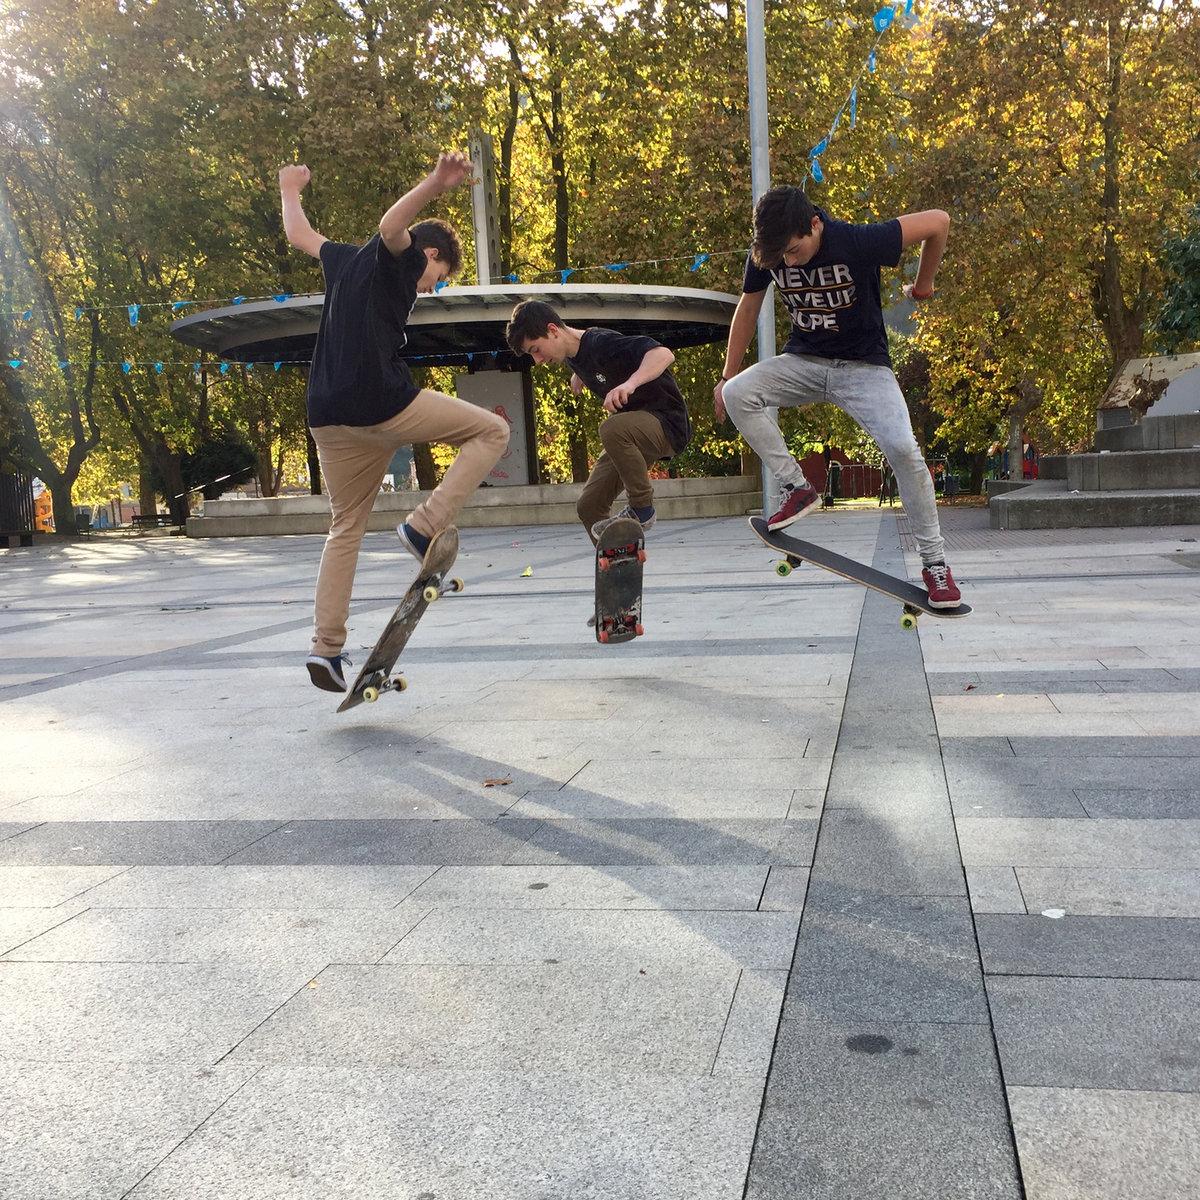 Pola De Laviana Mapa.Skaters Pola De Laviana Binaural Mapa Sonoru